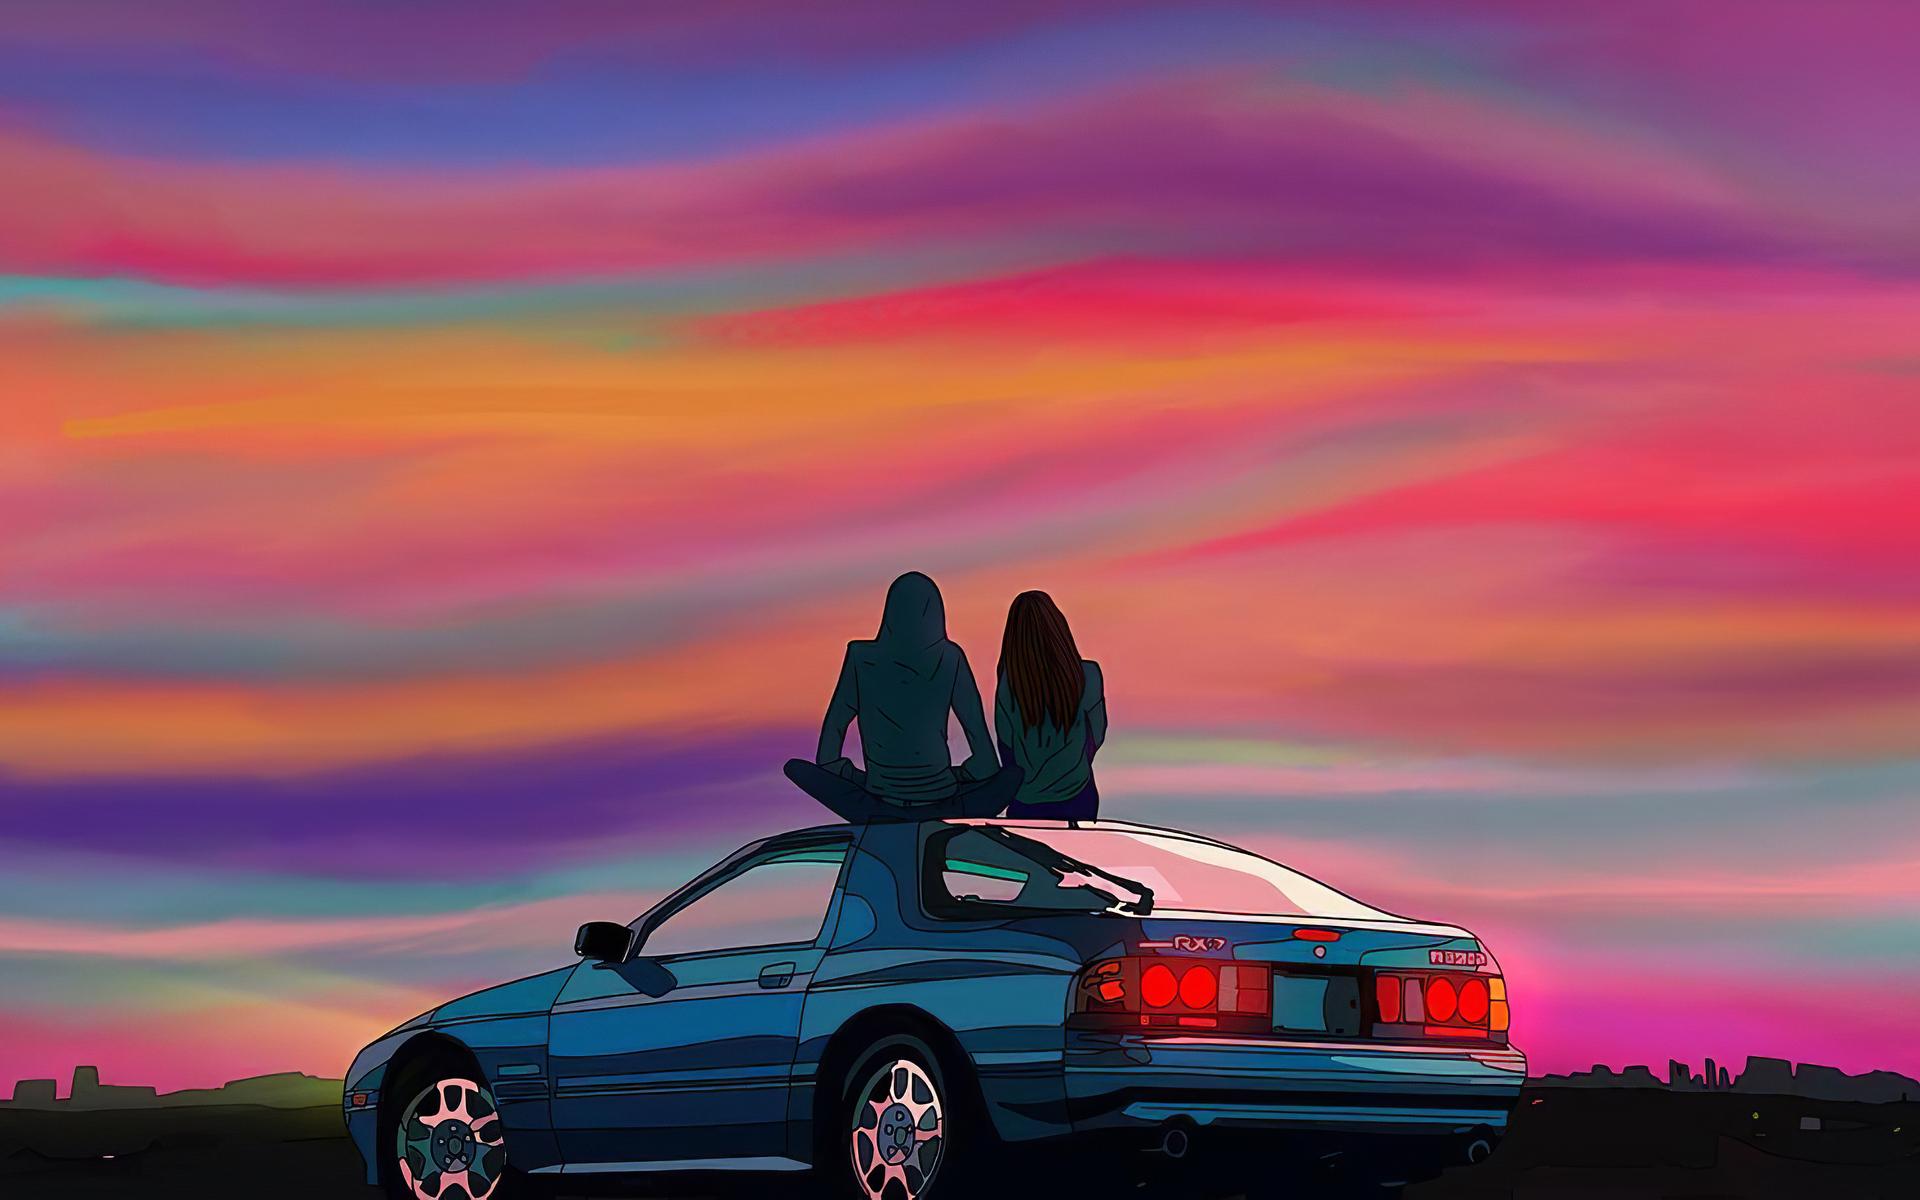 couple-sitting-on-car-evening-talks-4k-wb.jpg